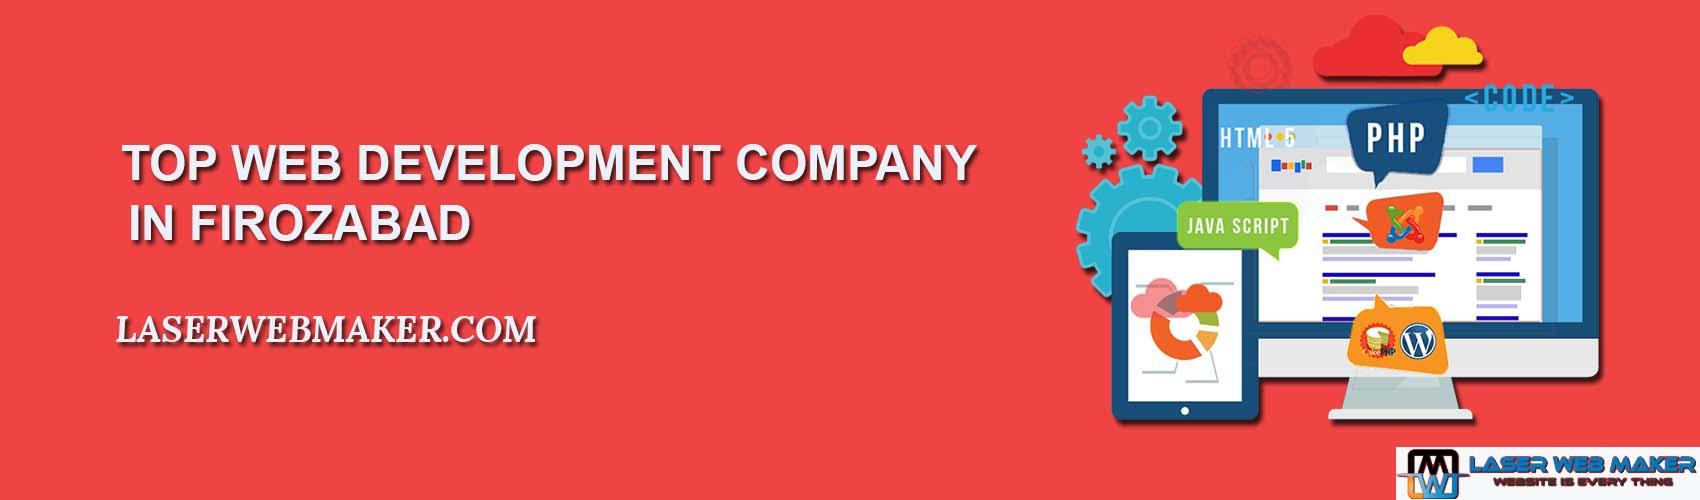 Top Web Development Company In Firozabad